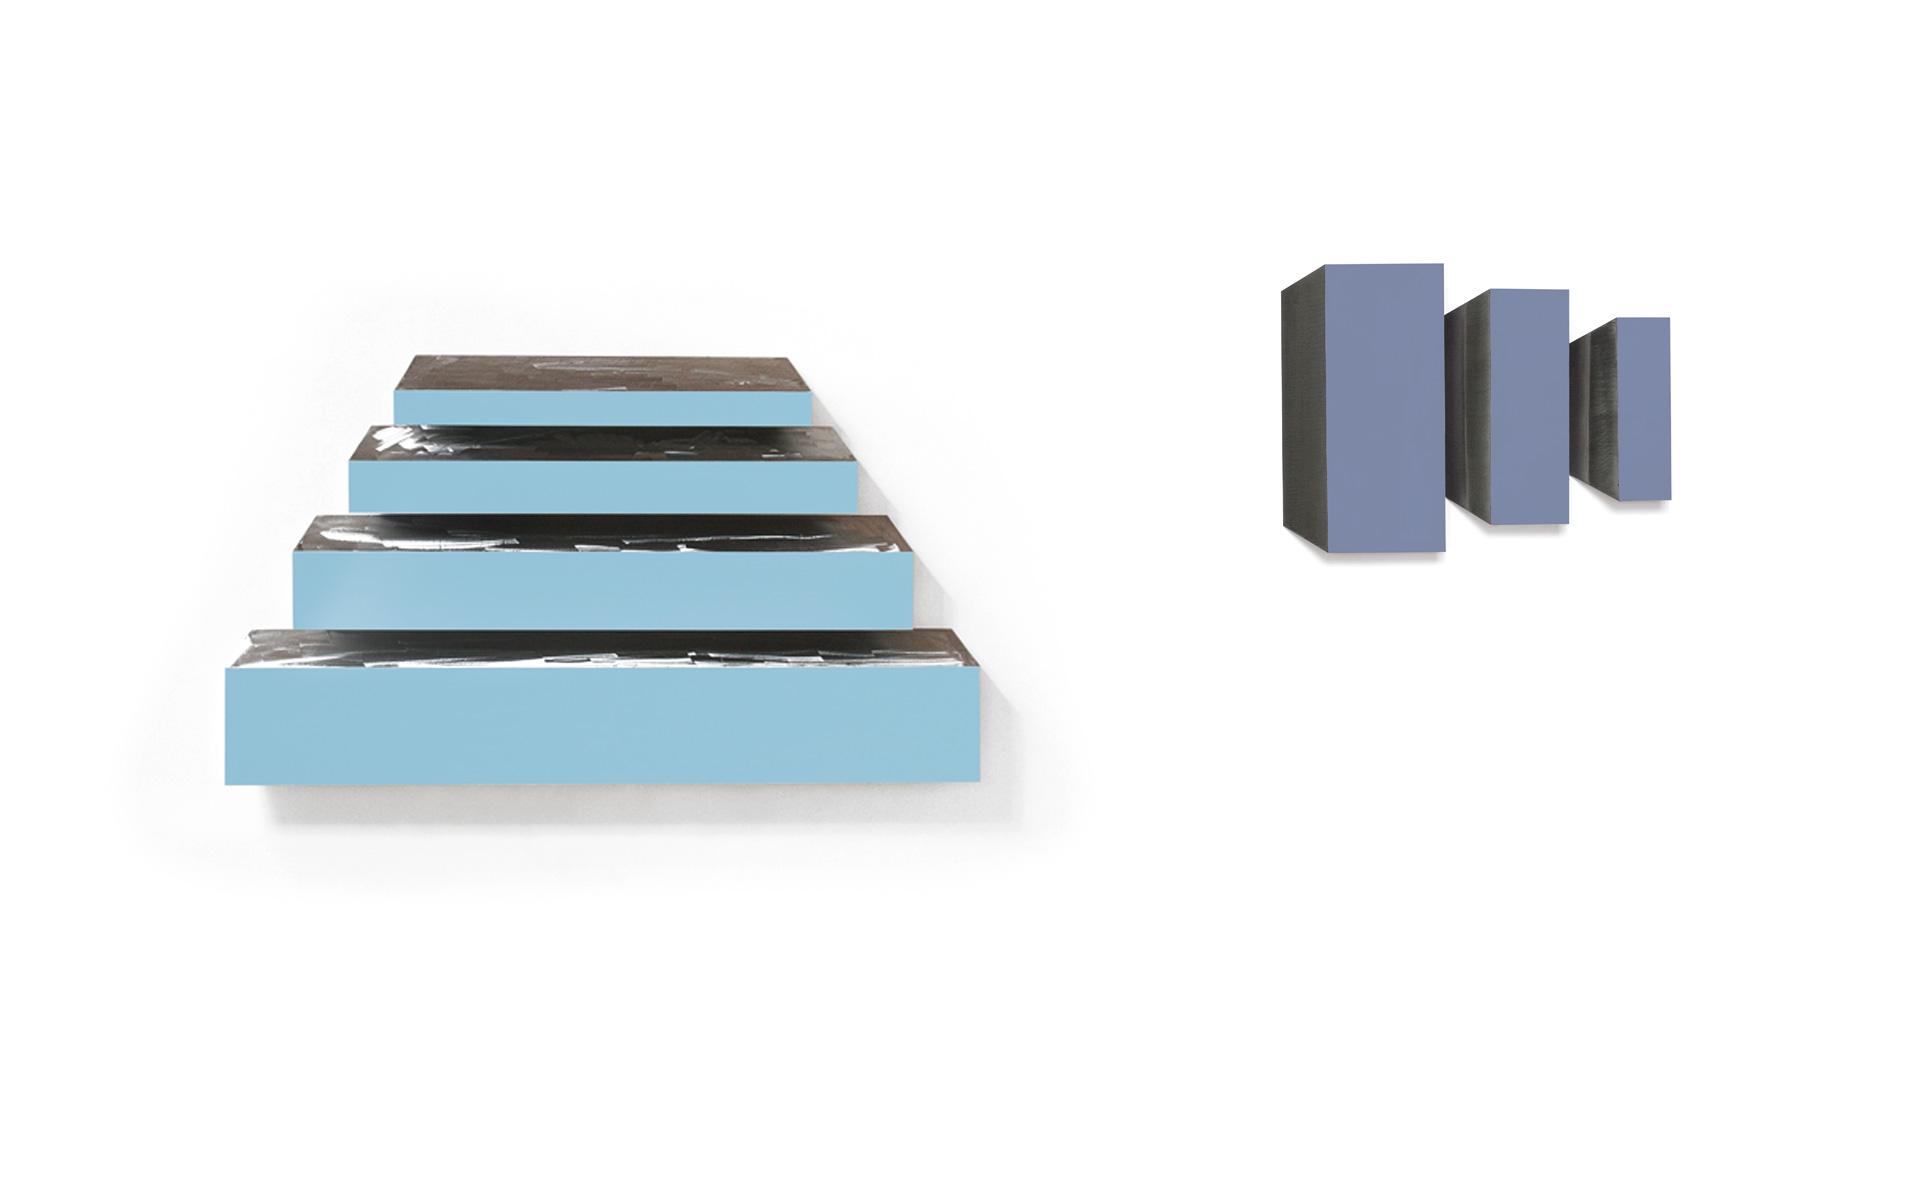 left: LANE, four parts, 2007 Acrylic on steel 92.5 × 162.3 × 8 cm / right: VENDOME, three parts, 2007 Acrylic on steel 43.8 × 59.4 × 4.2 cm - Photos: Christoph Valentien